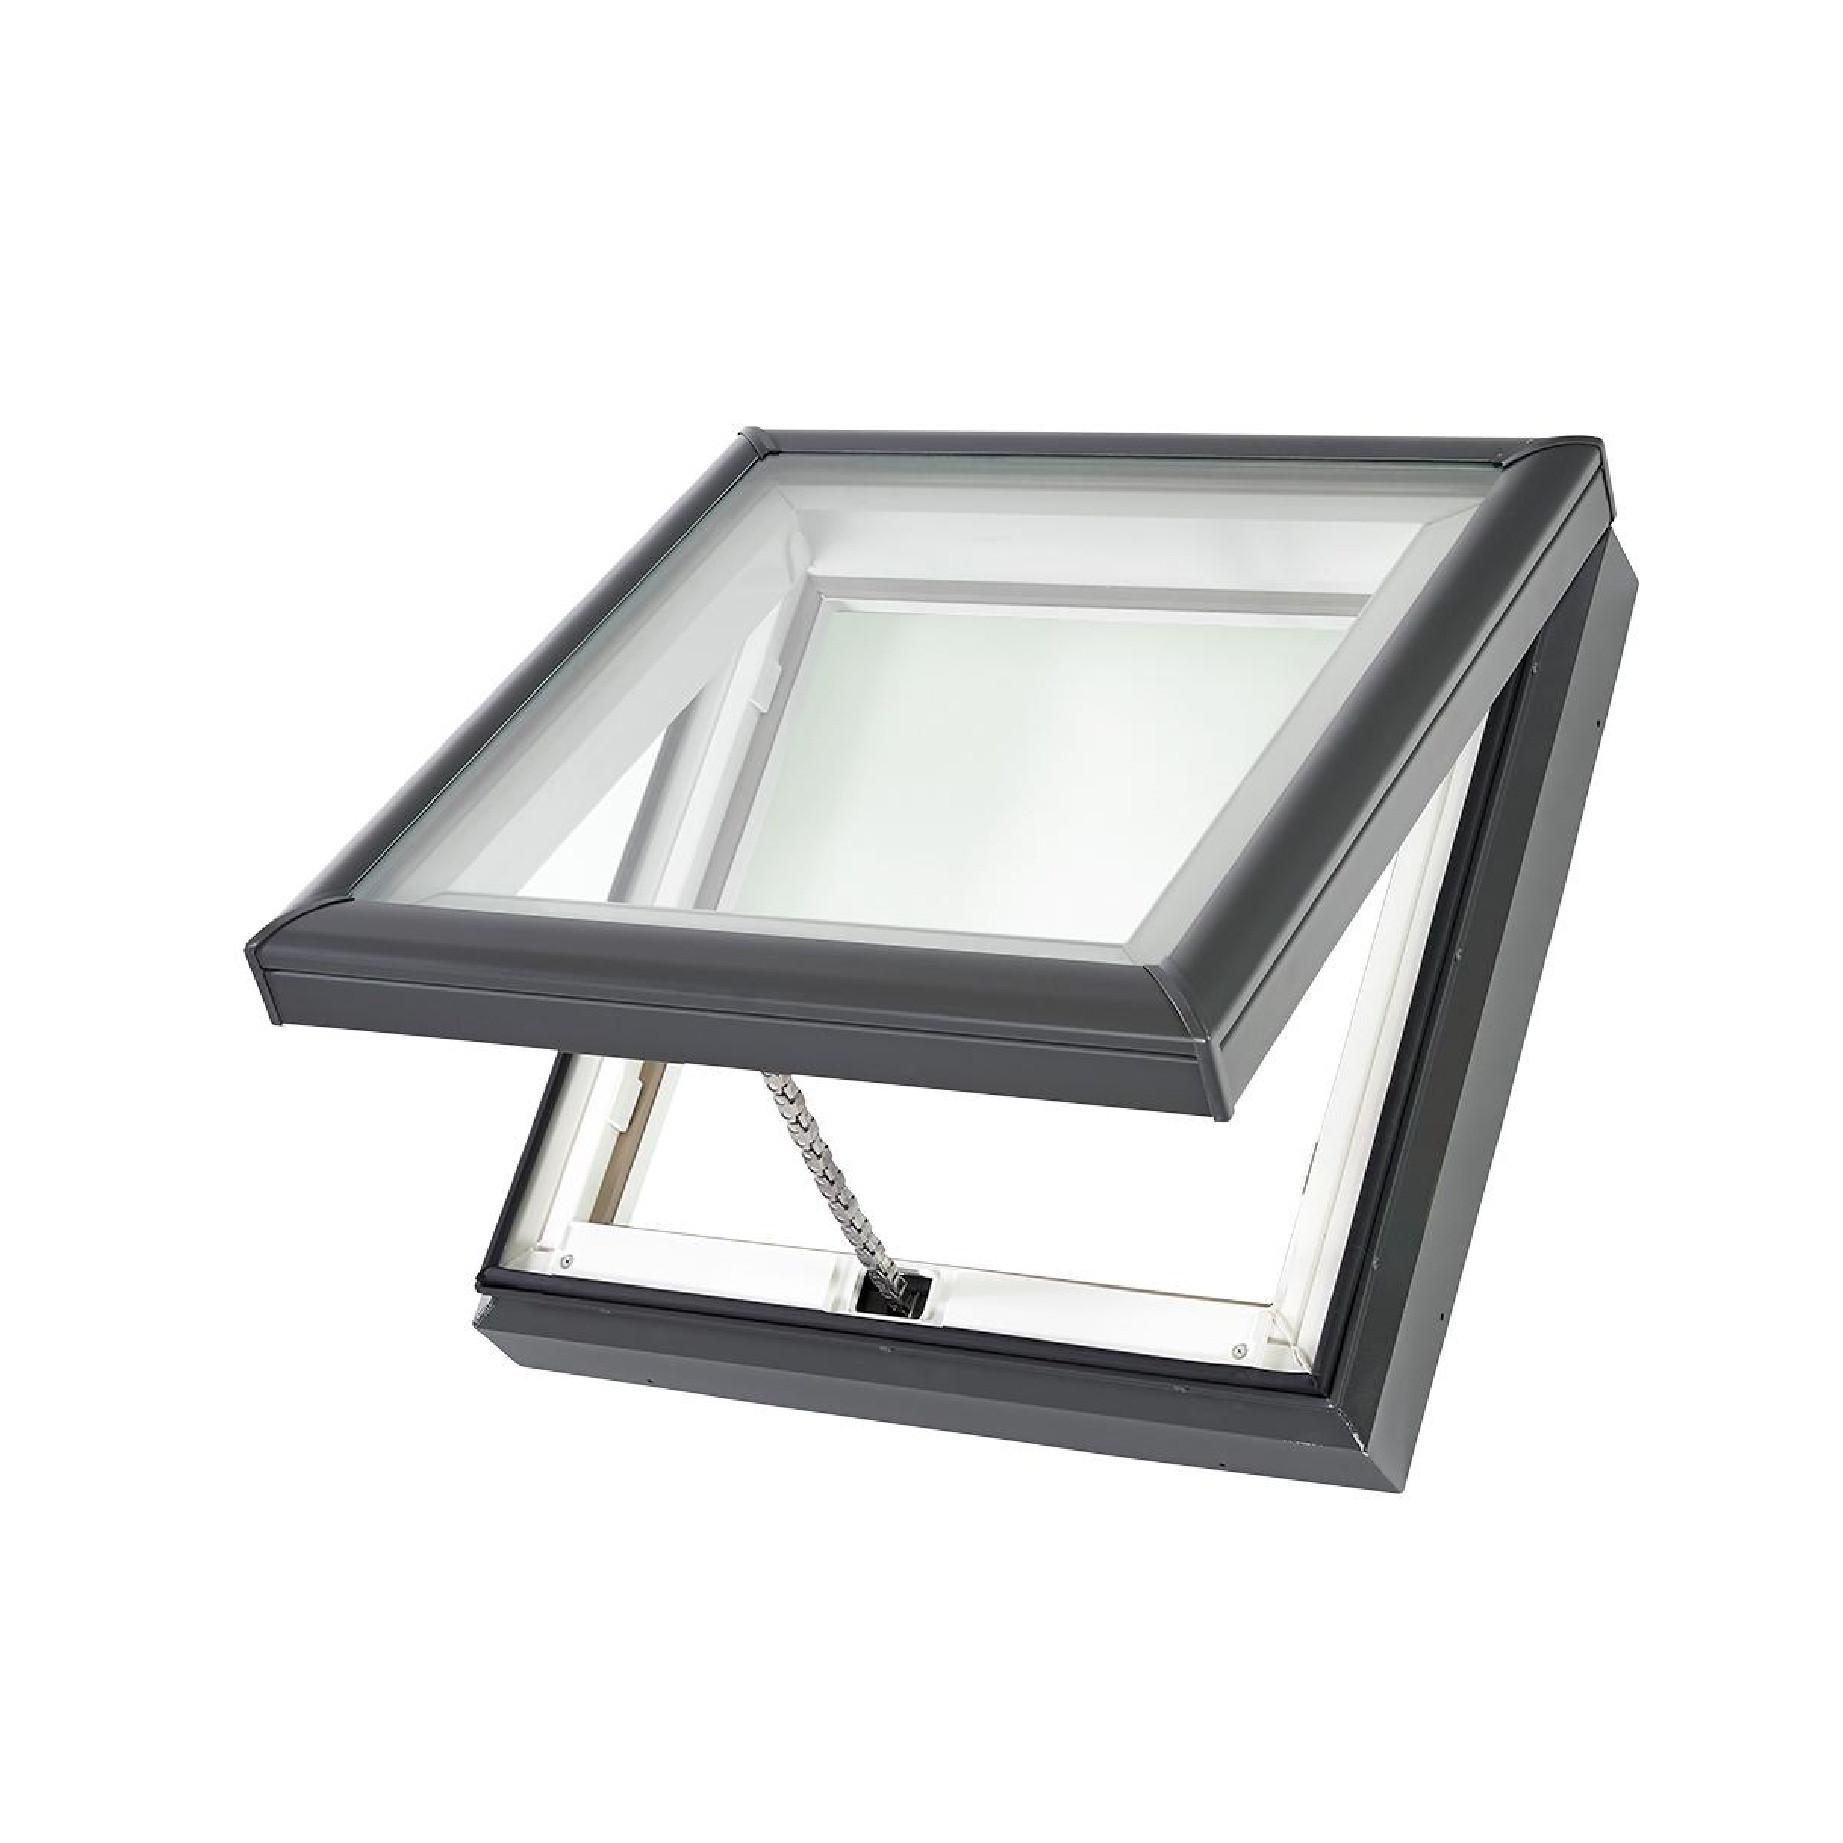 Buy skylight pilkington power hammer